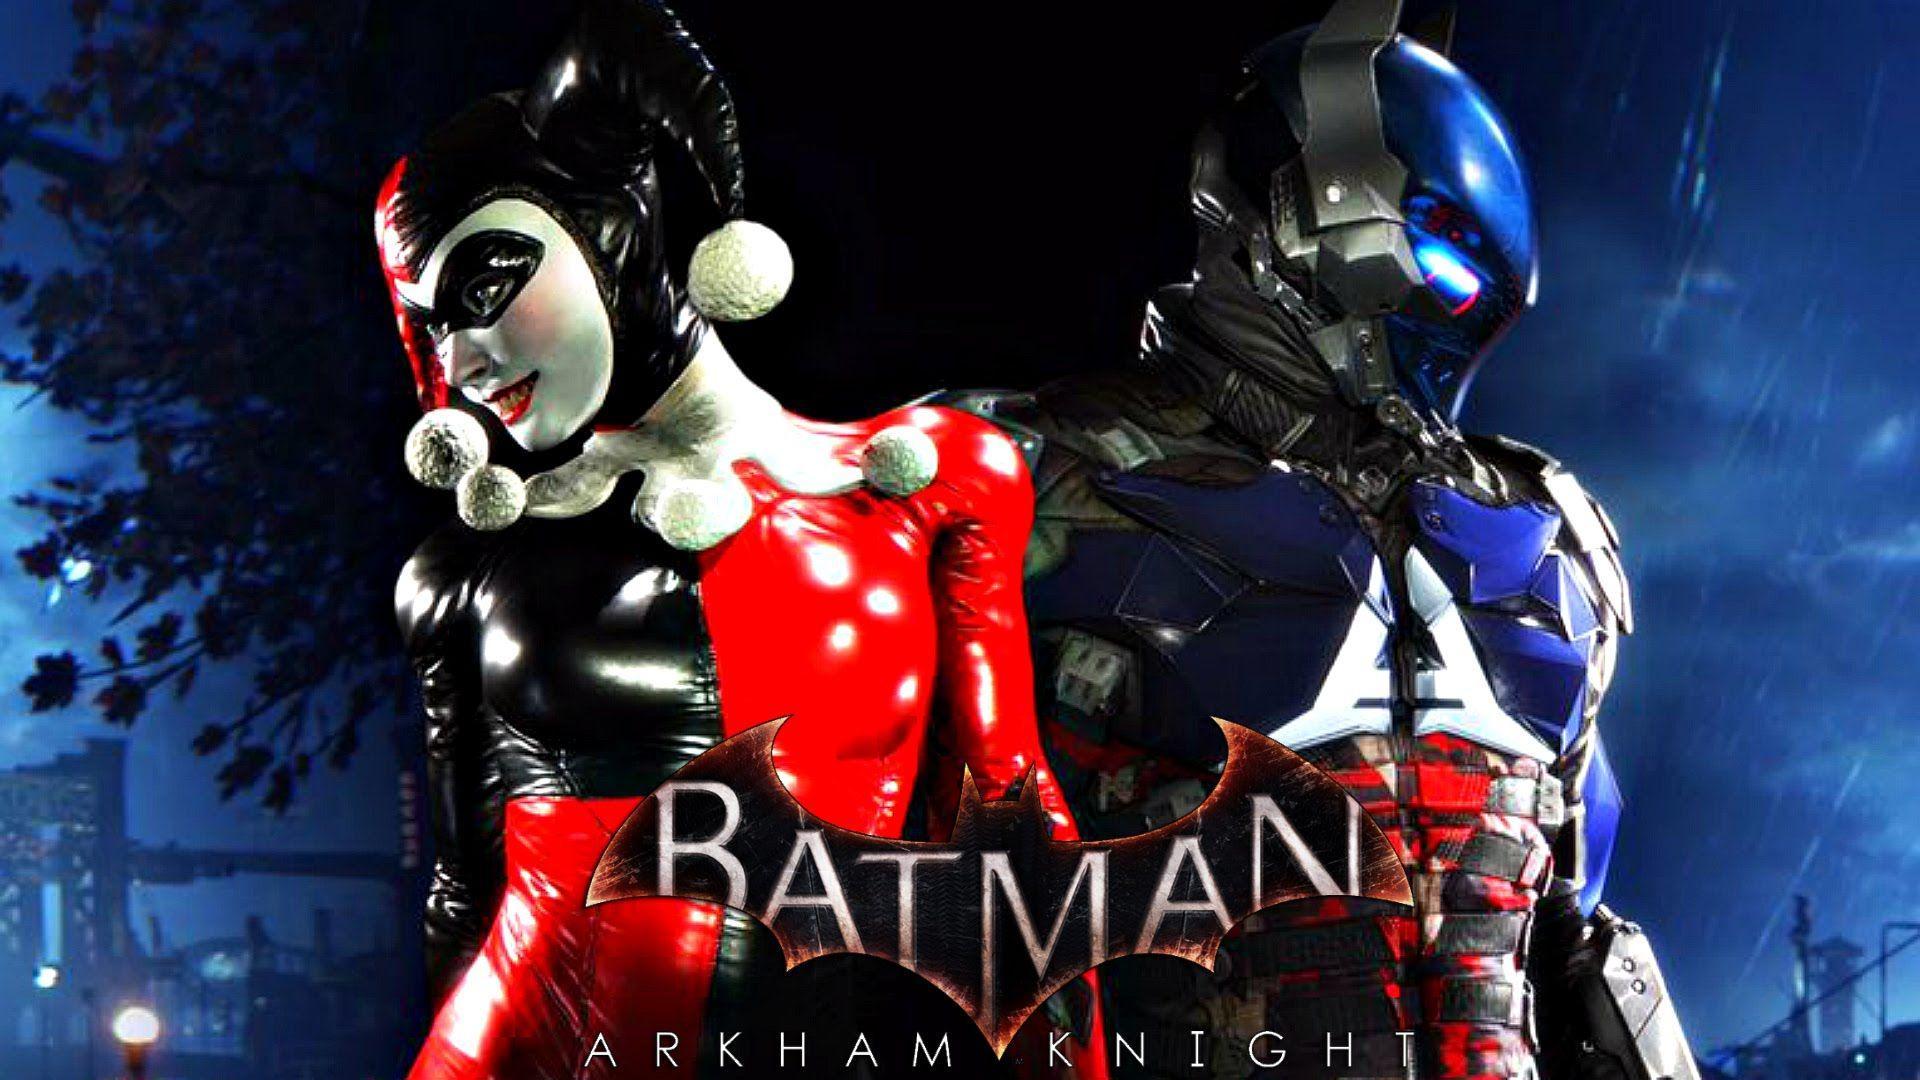 Harley Quinn Arkham City Wallpapers Top Free Harley Quinn Arkham